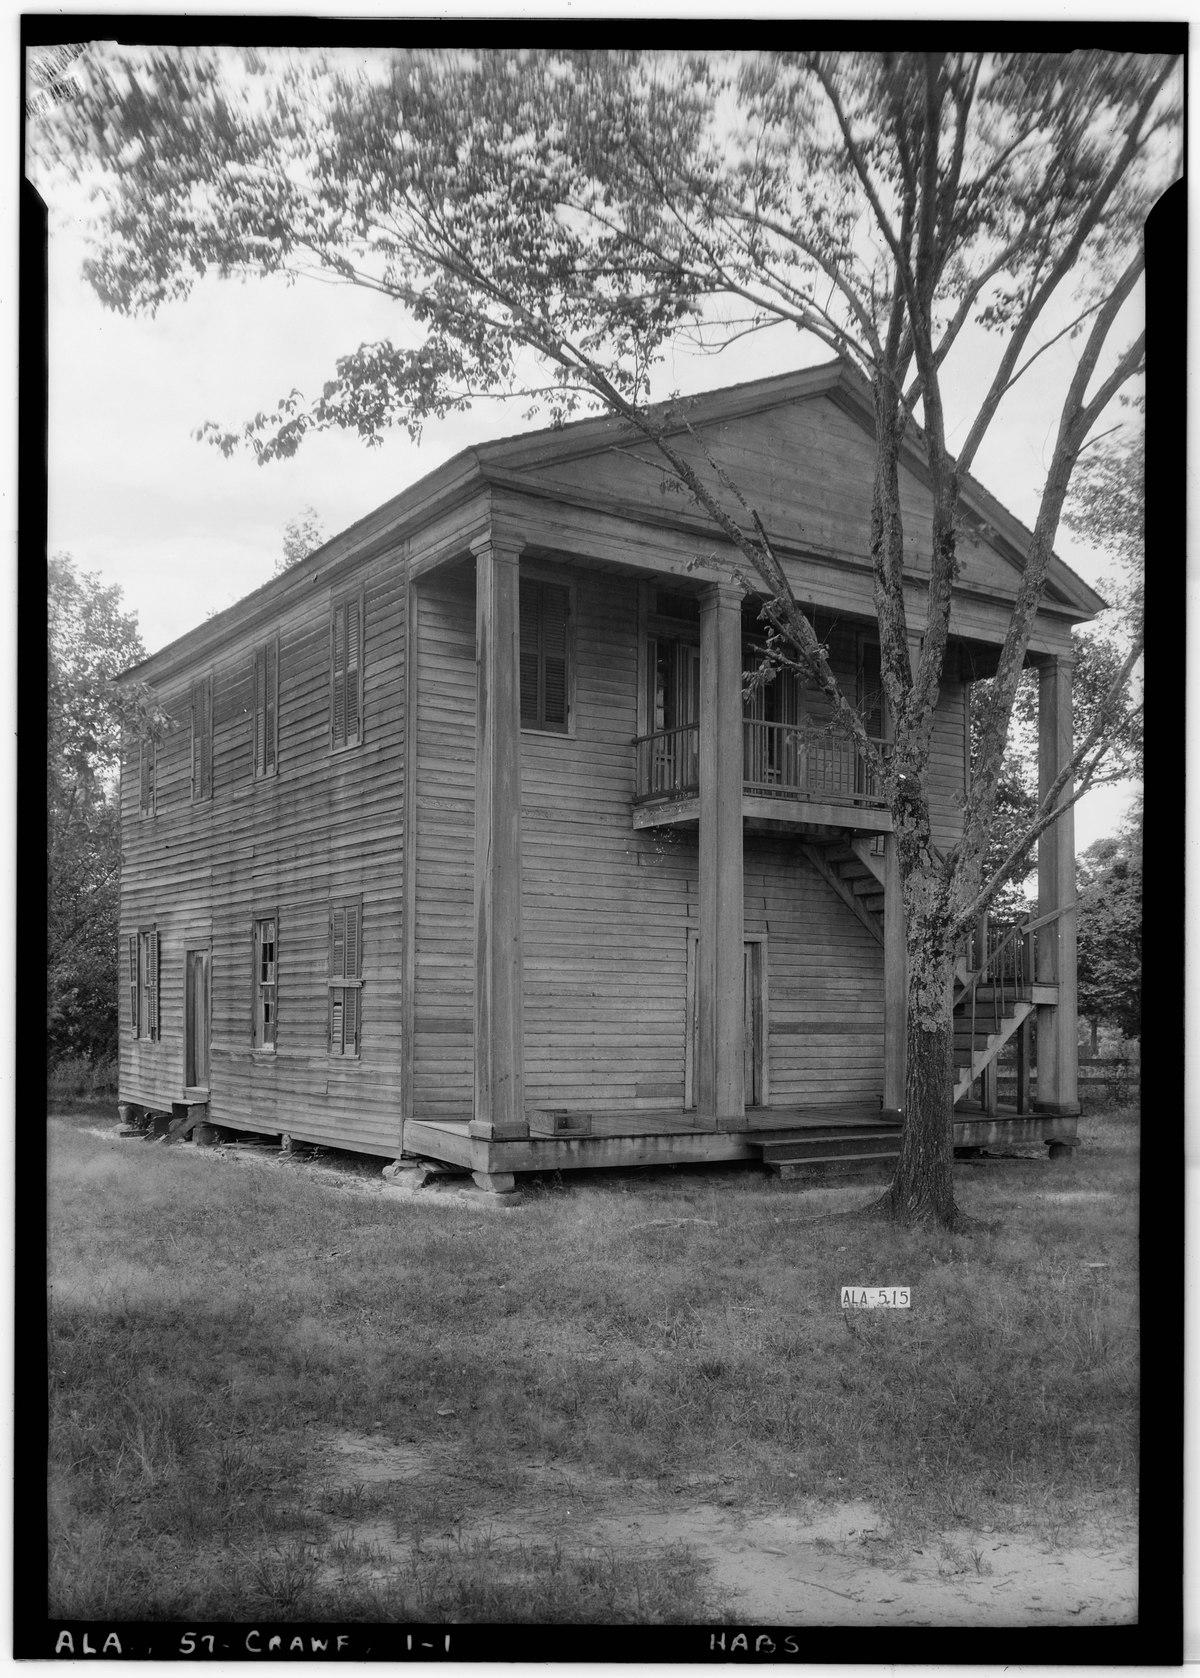 Alabama russell county cottonton 36859 - Alabama Russell County Cottonton 36859 5